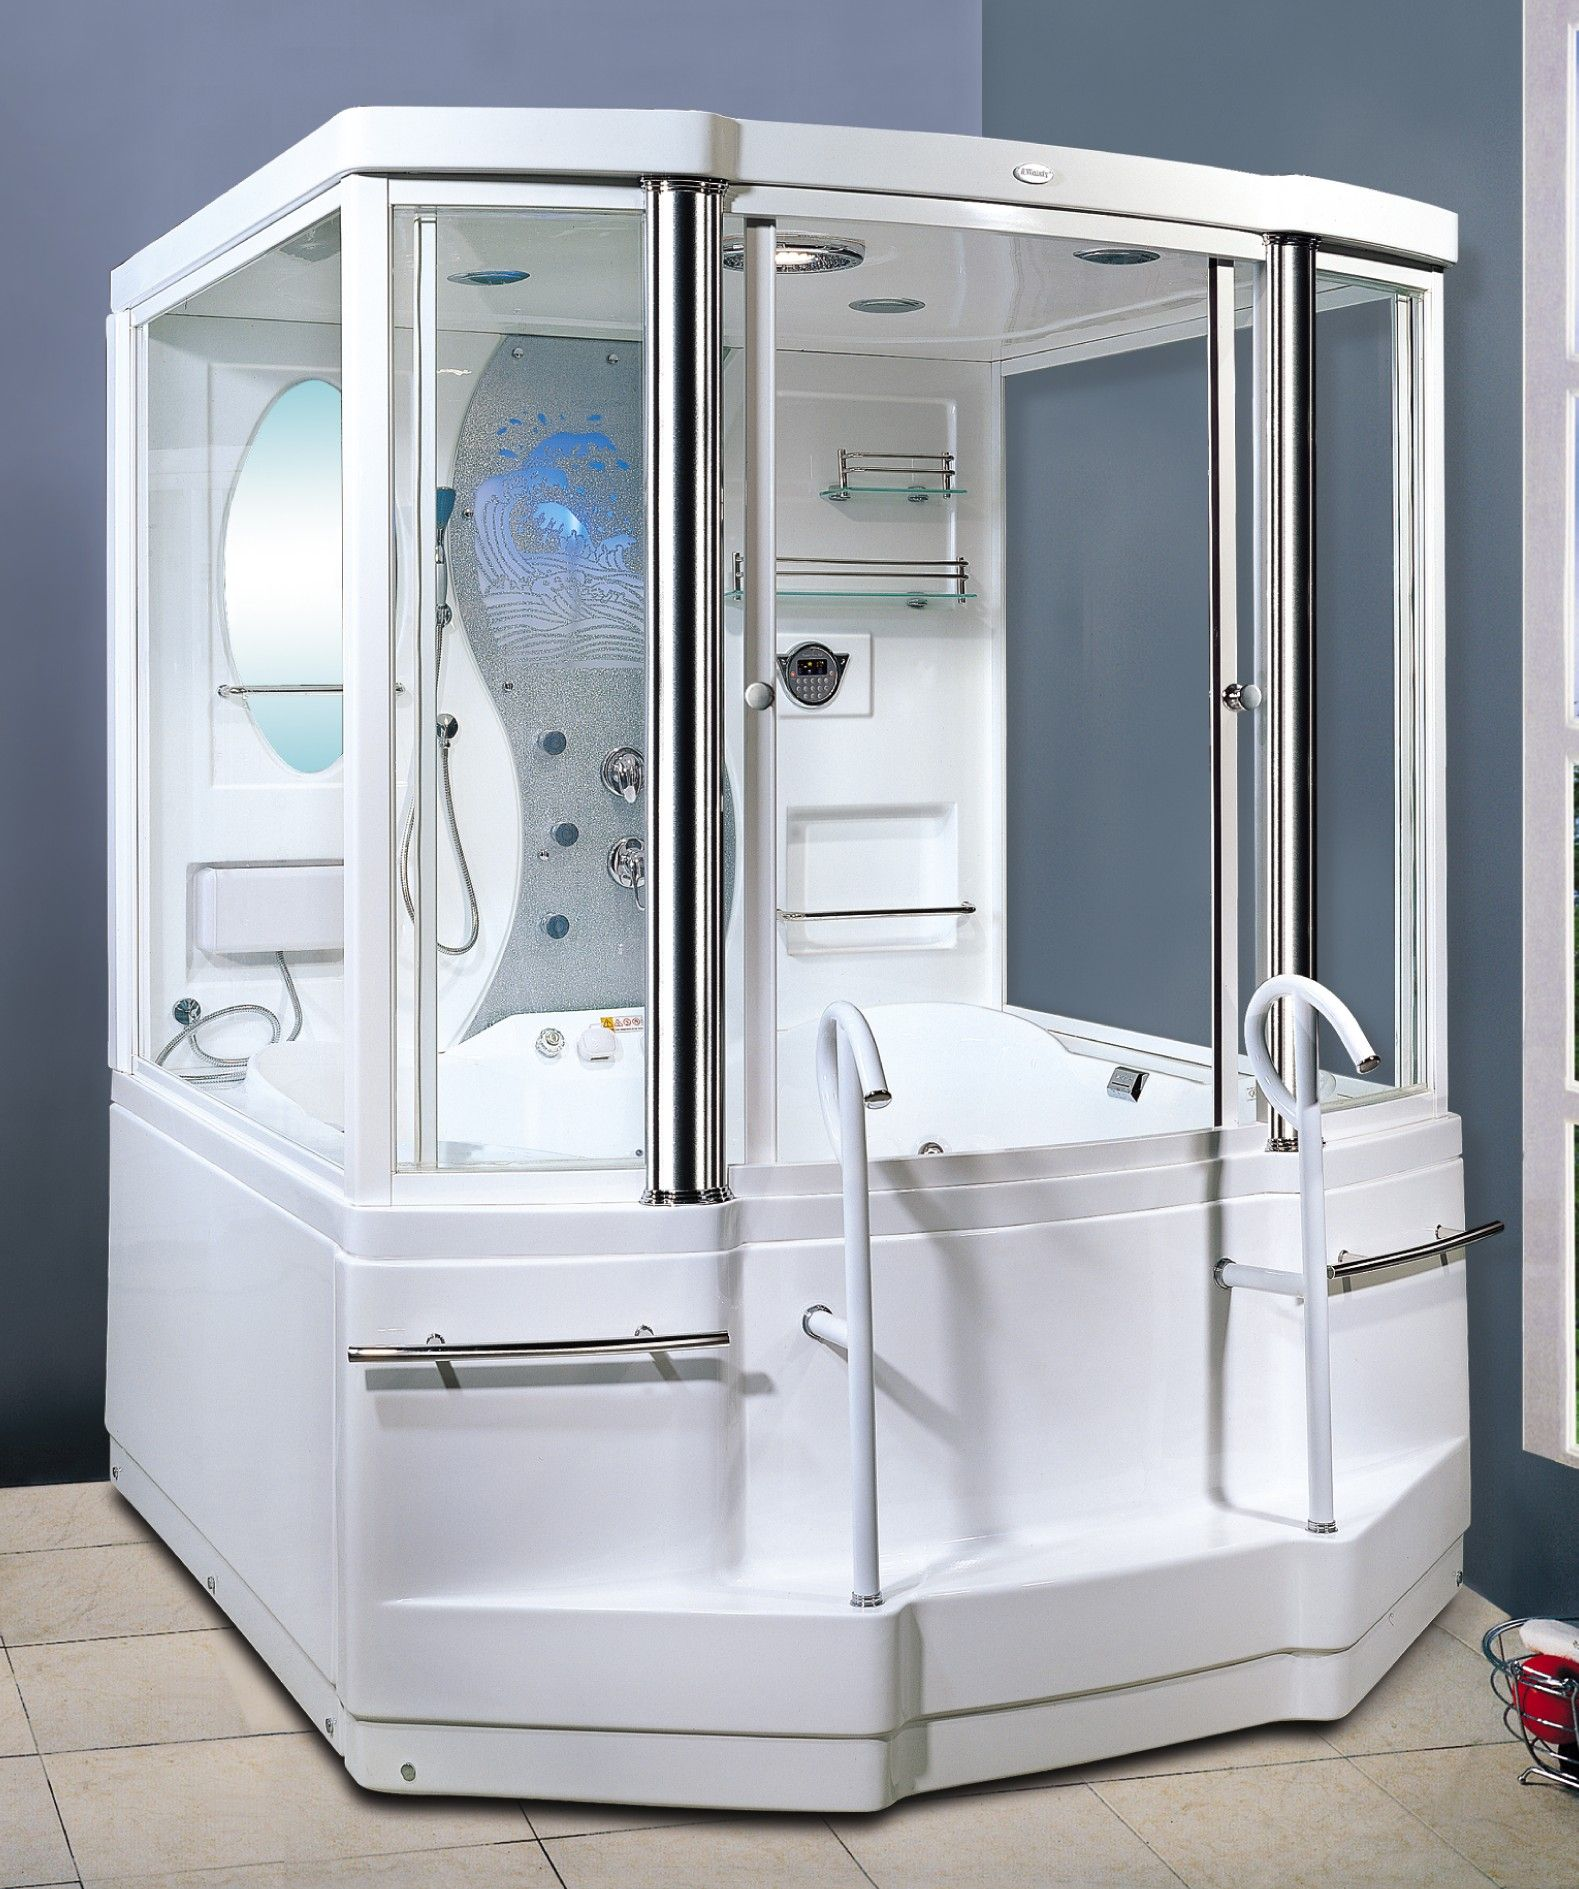 Cool steam shower tub. Also, a time machine. @thediyconsumer ...